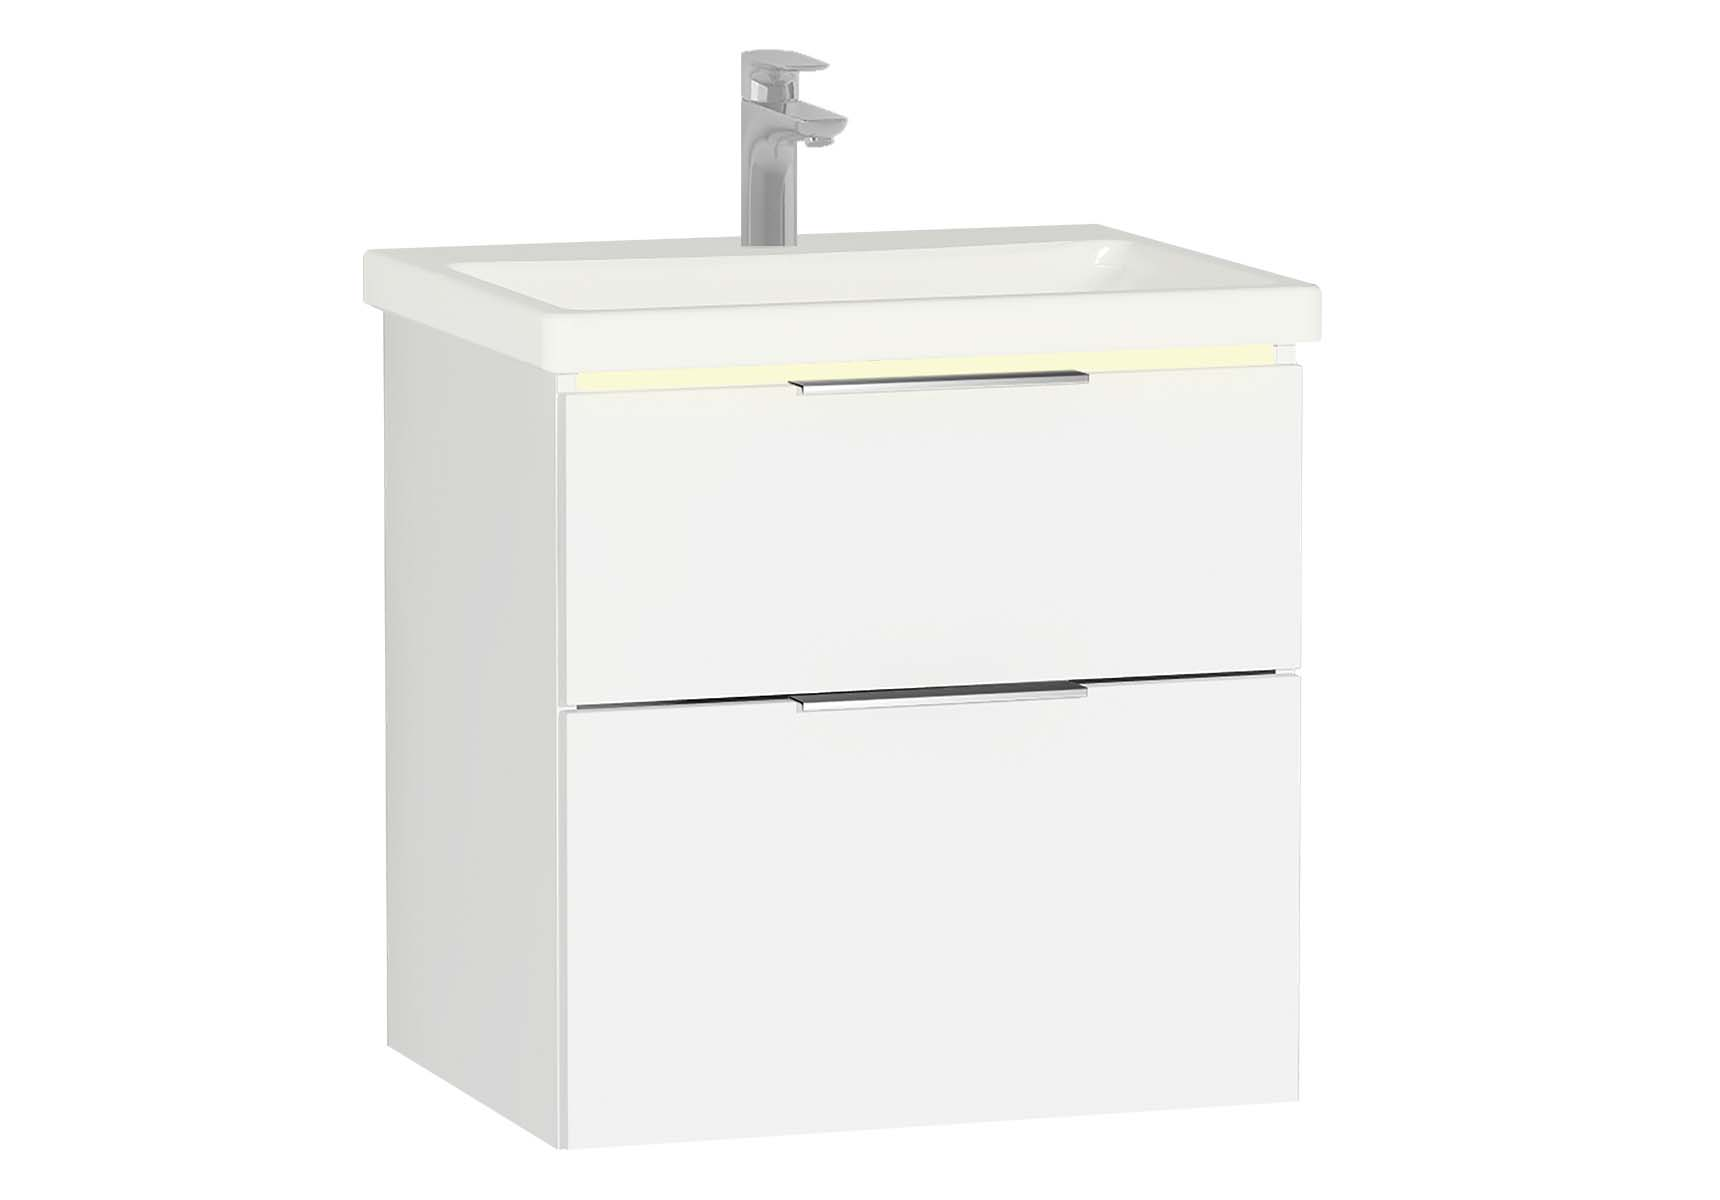 Central Washbasin Unit with 2 drawers, 60 cm, White High Gloss, Ceramic Washbasin, Led